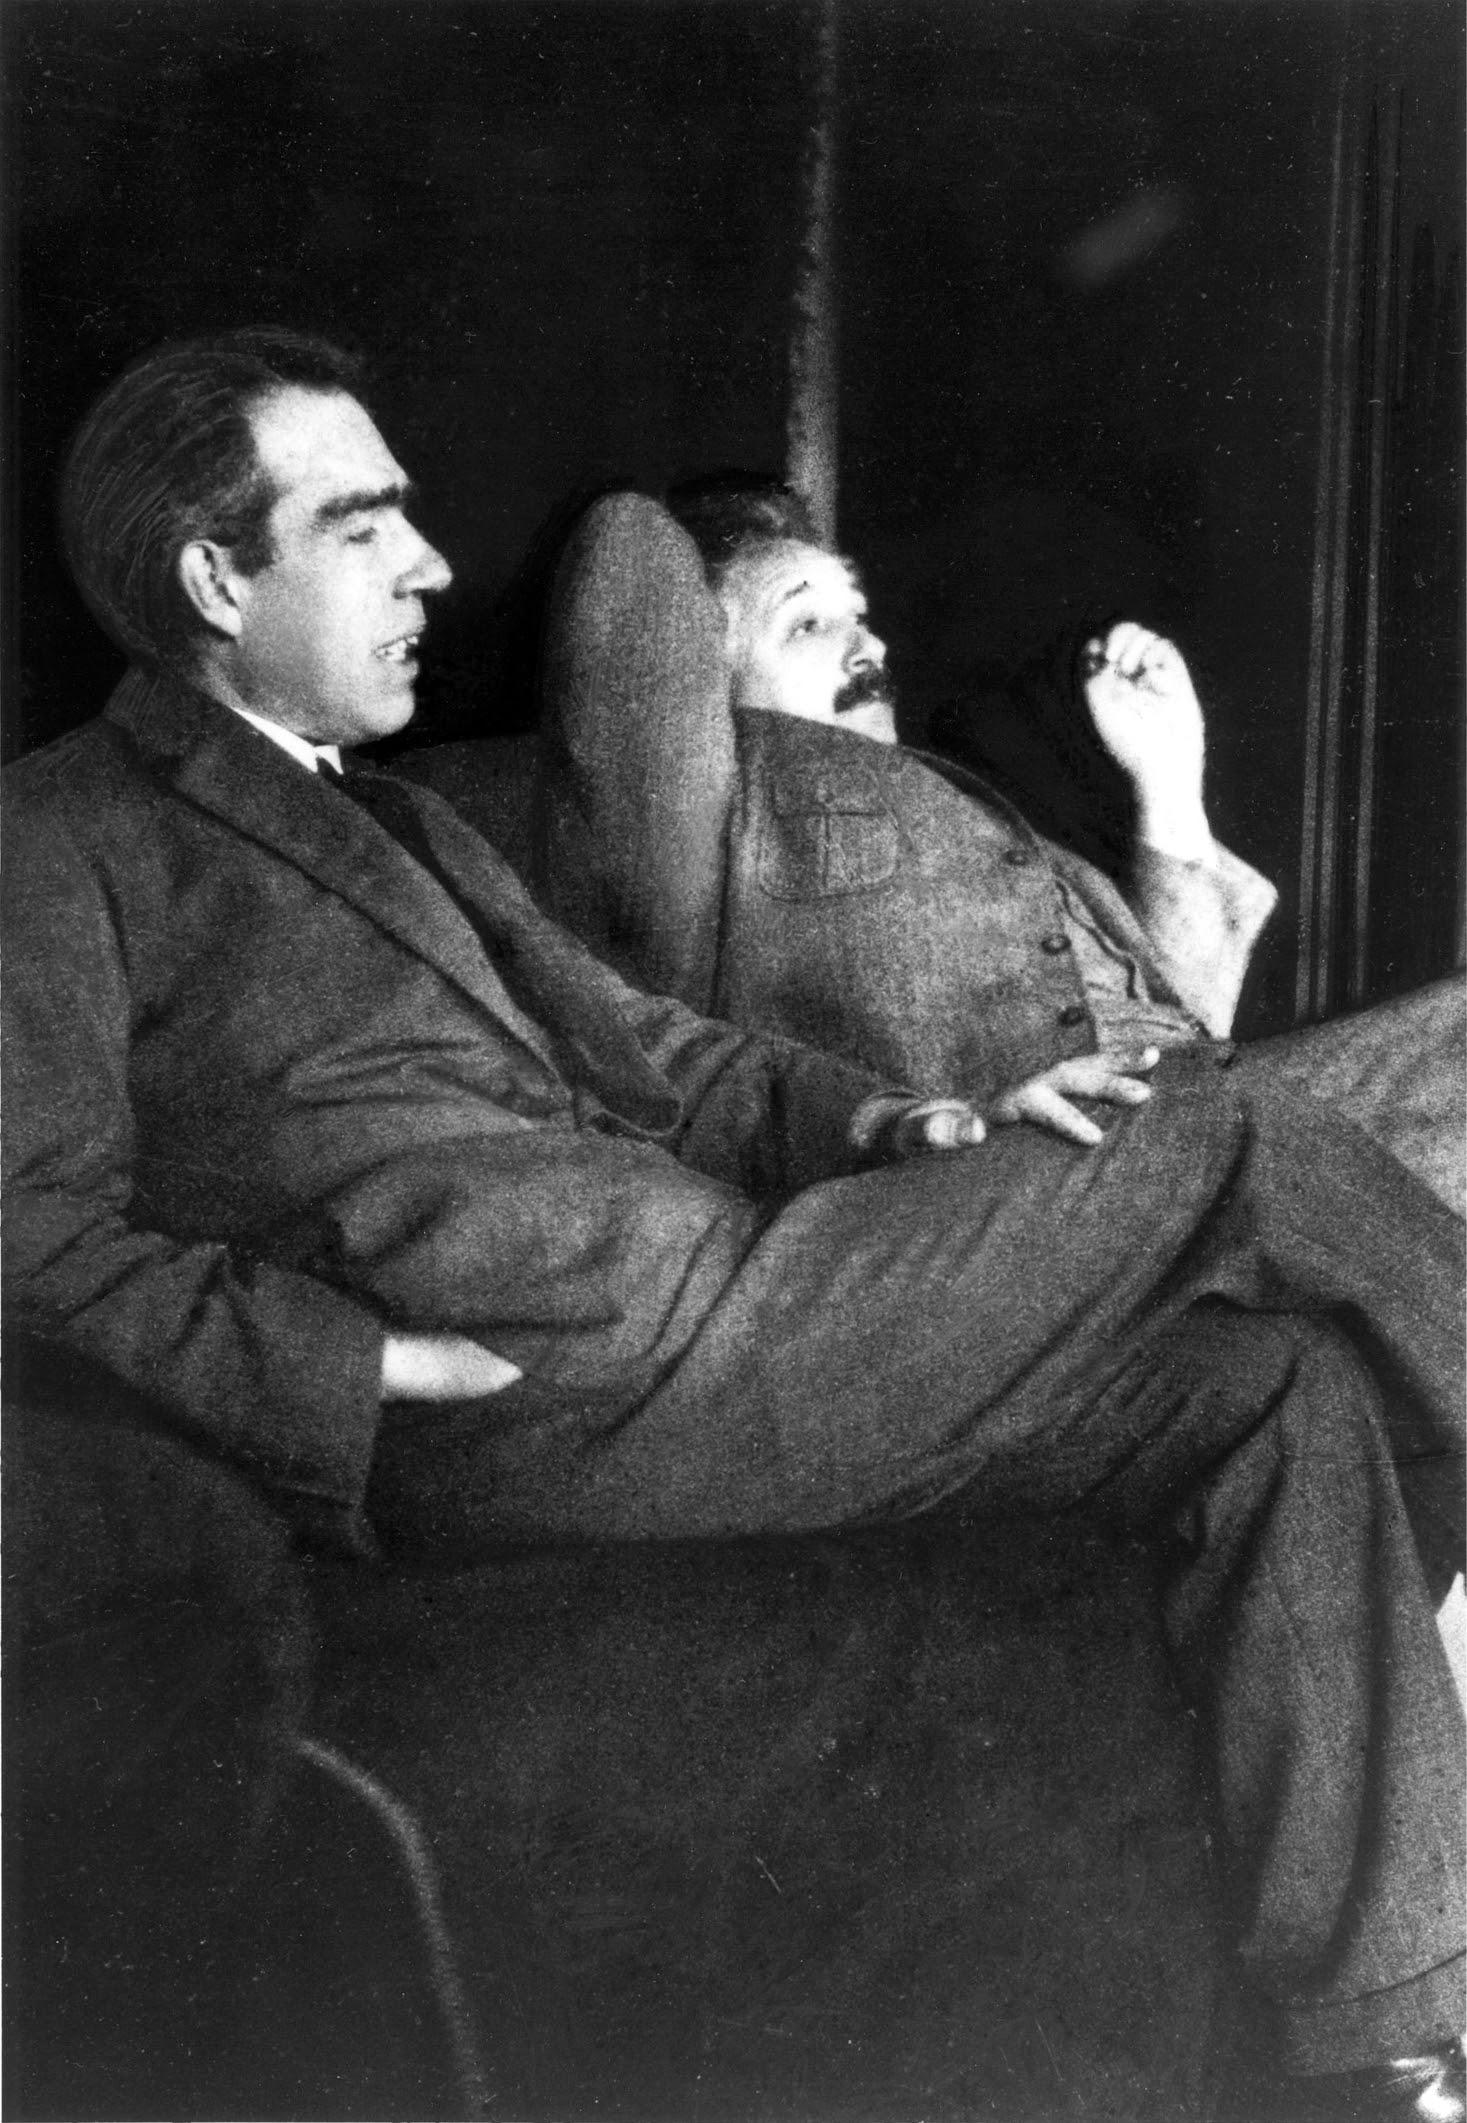 http://upload.wikimedia.org/wikipedia/commons/d/d5/Niels_Bohr_Albert_Einstein_by_Ehrenfest.jpg